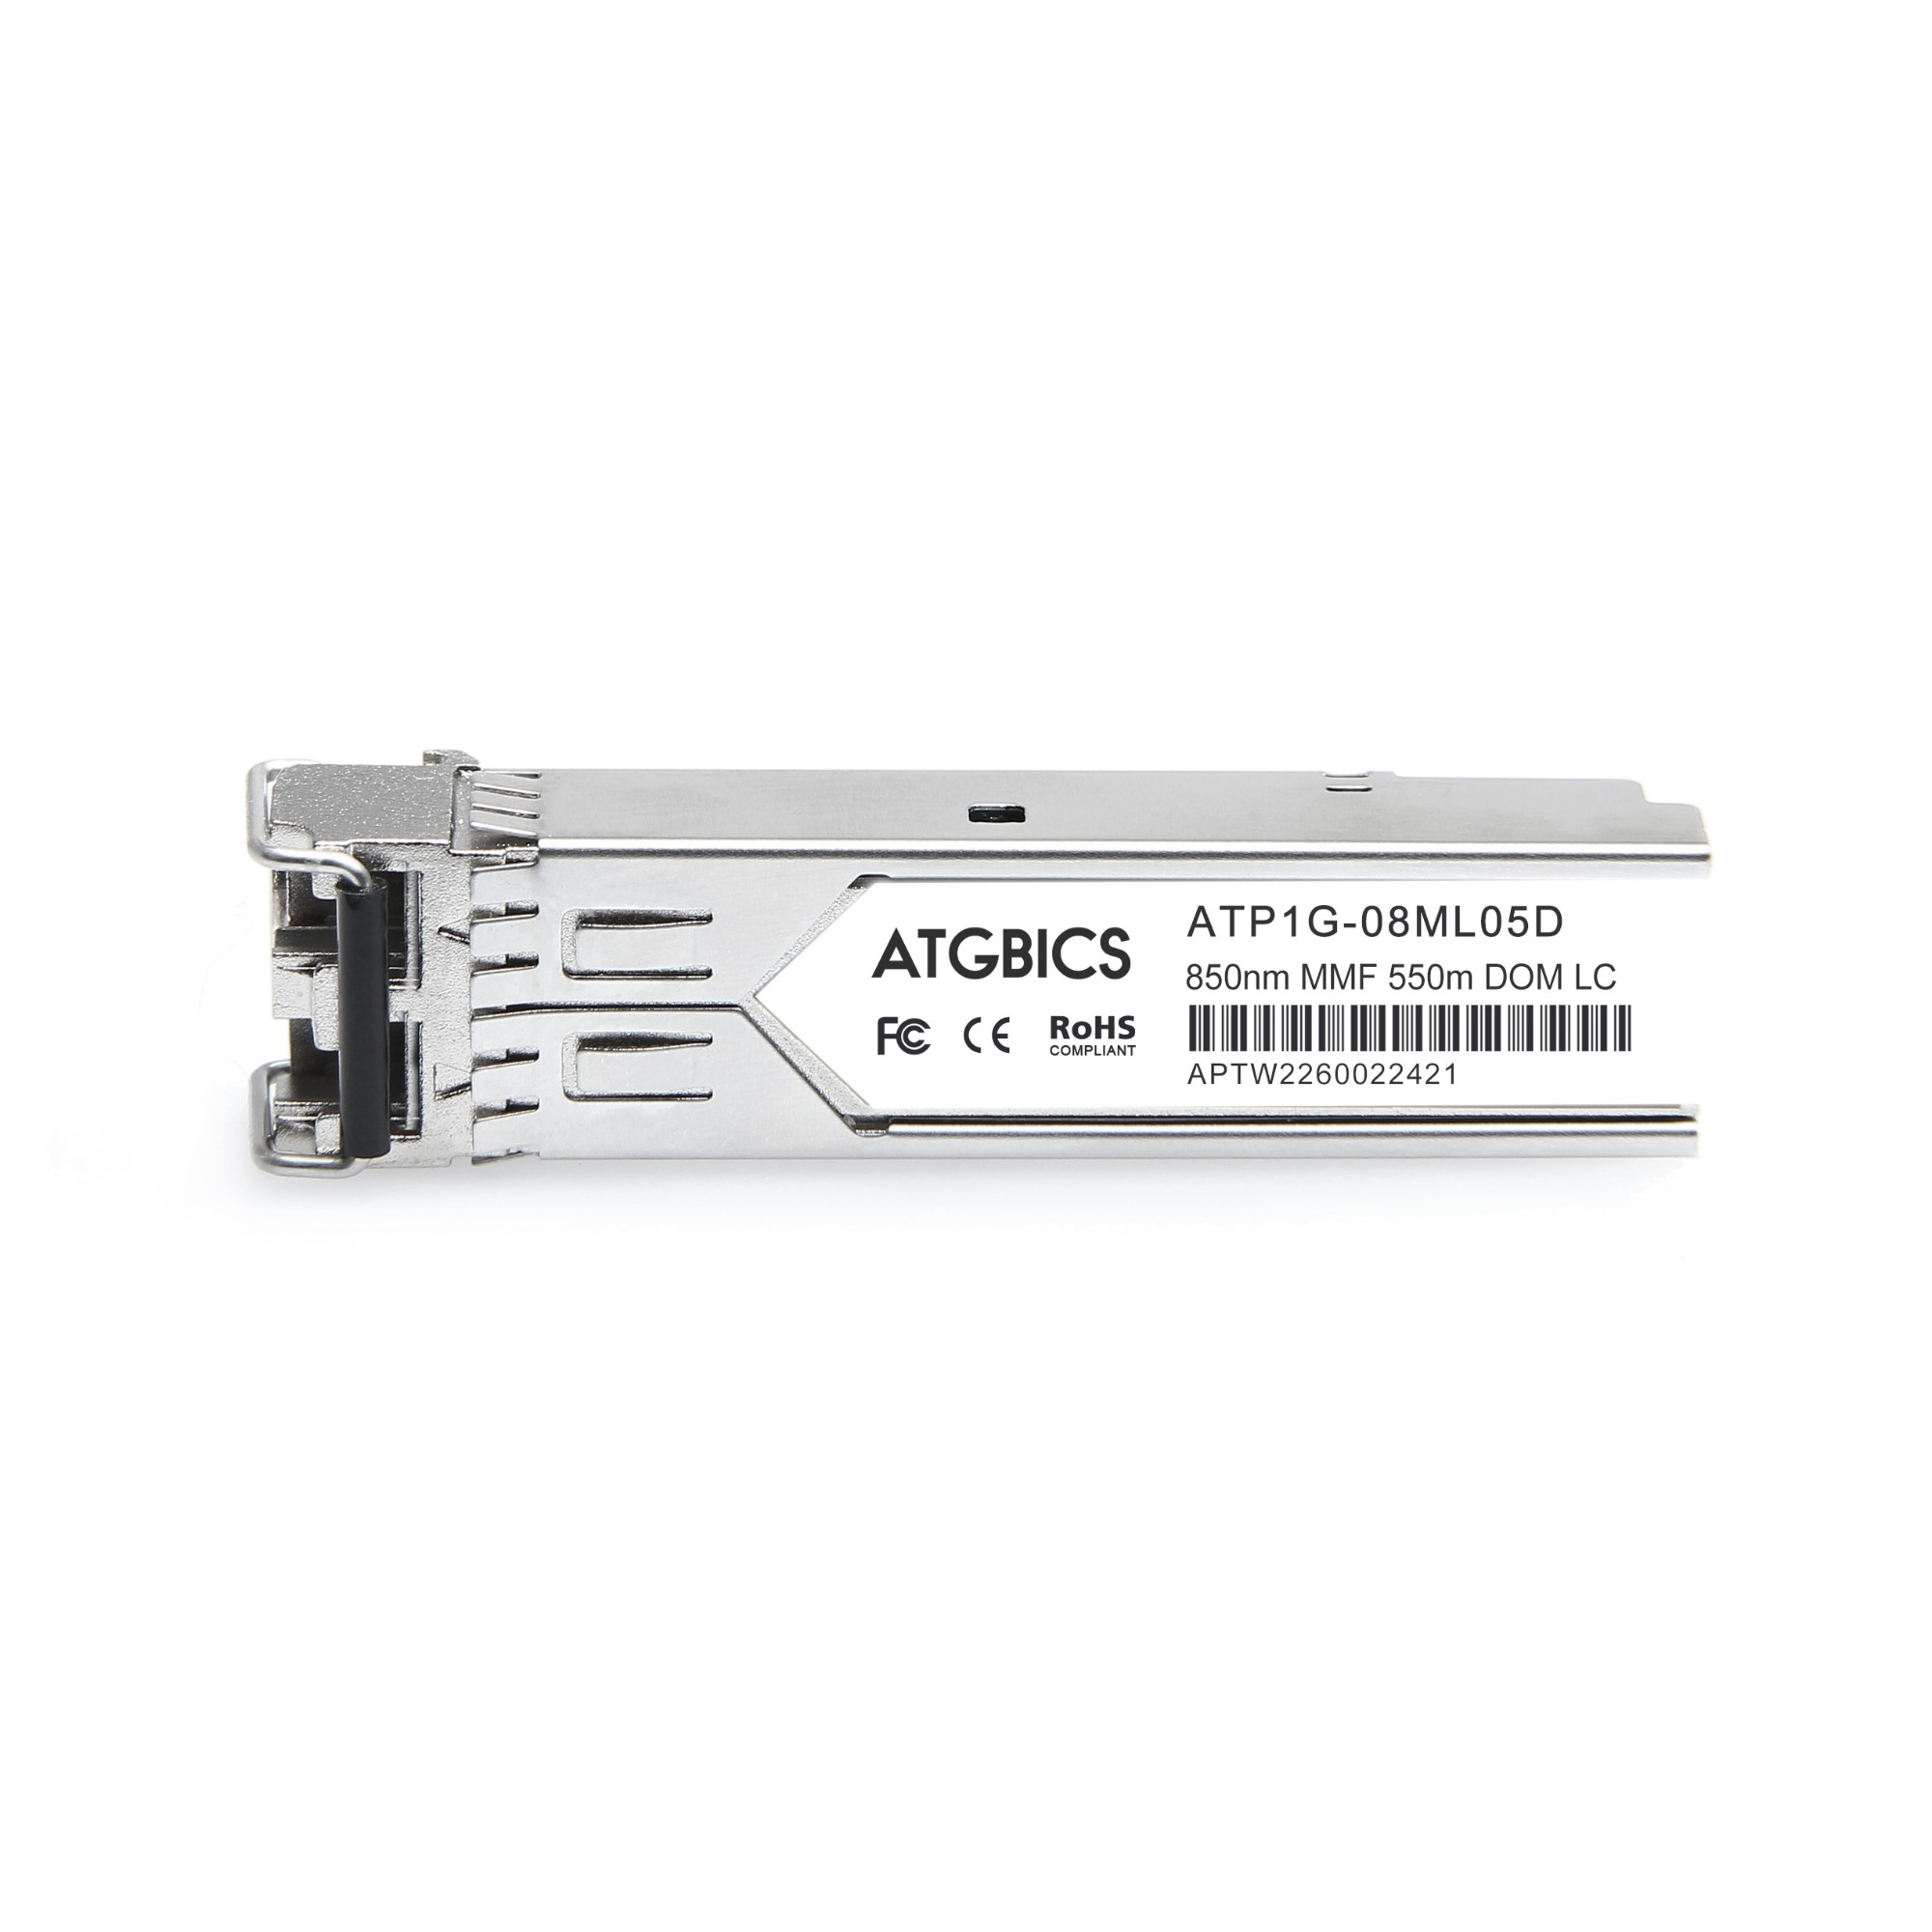 Image of ATGBICS J4858D-C network transceiver module Fiber optic 1000 Mbit/s SFP 850 nm